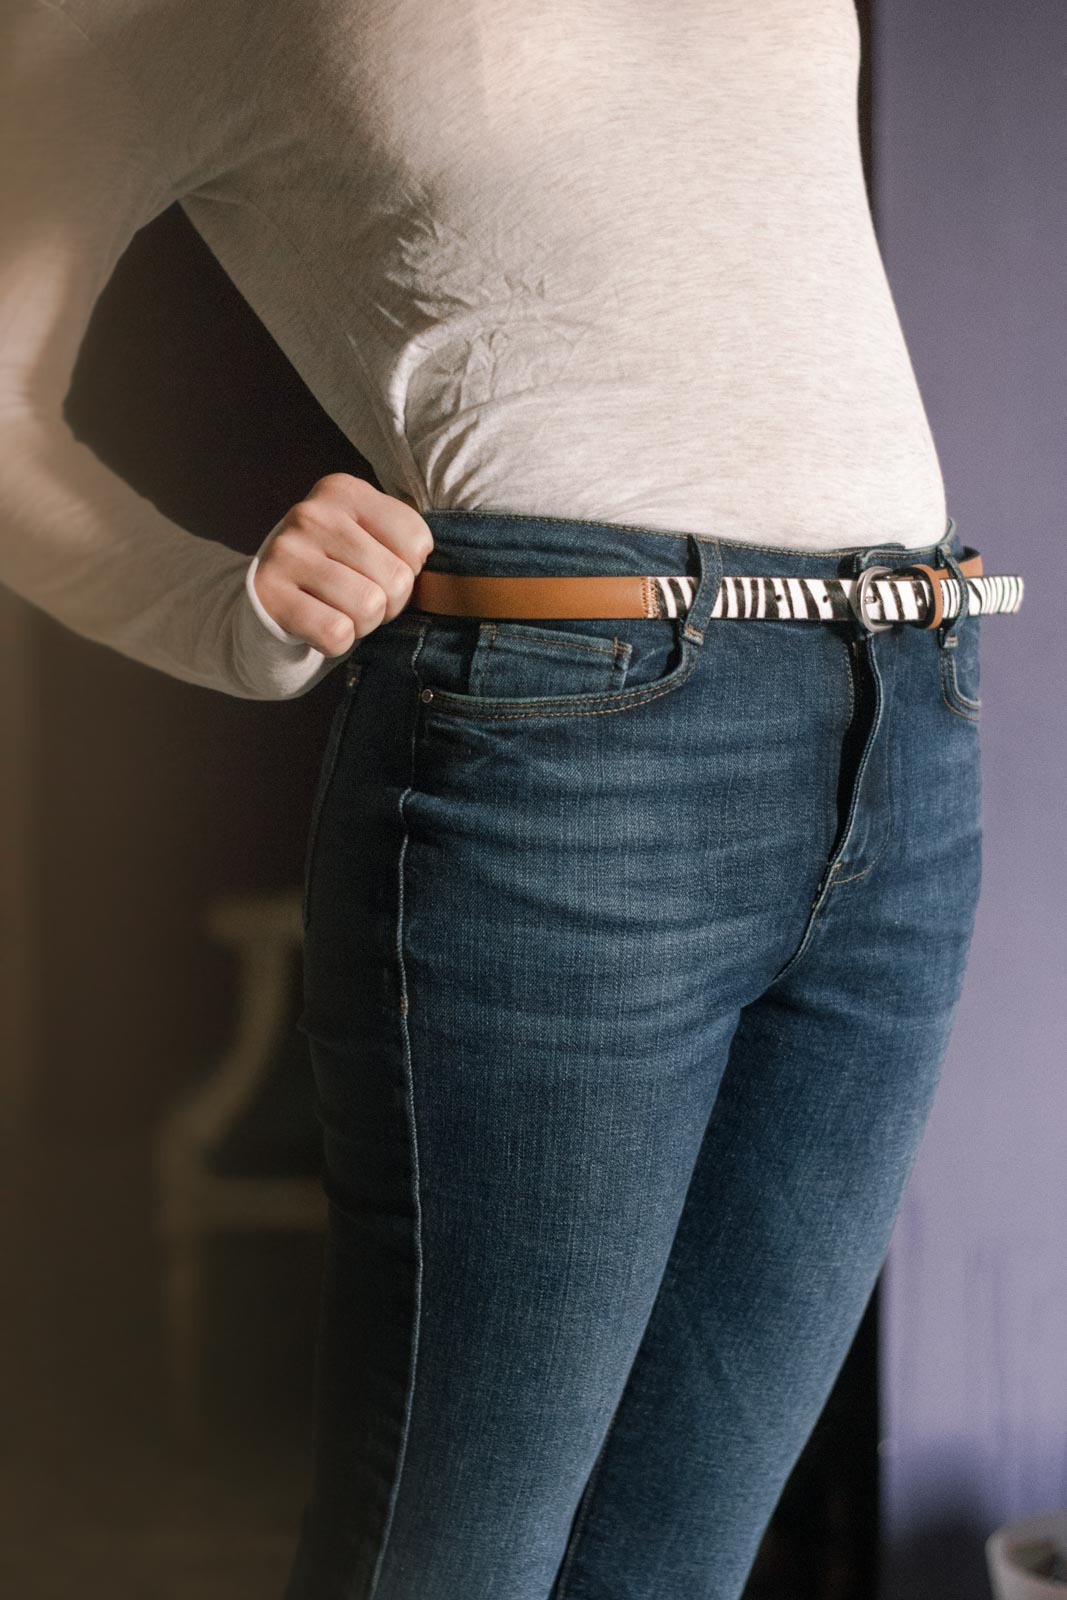 double G buckle Gucci belt